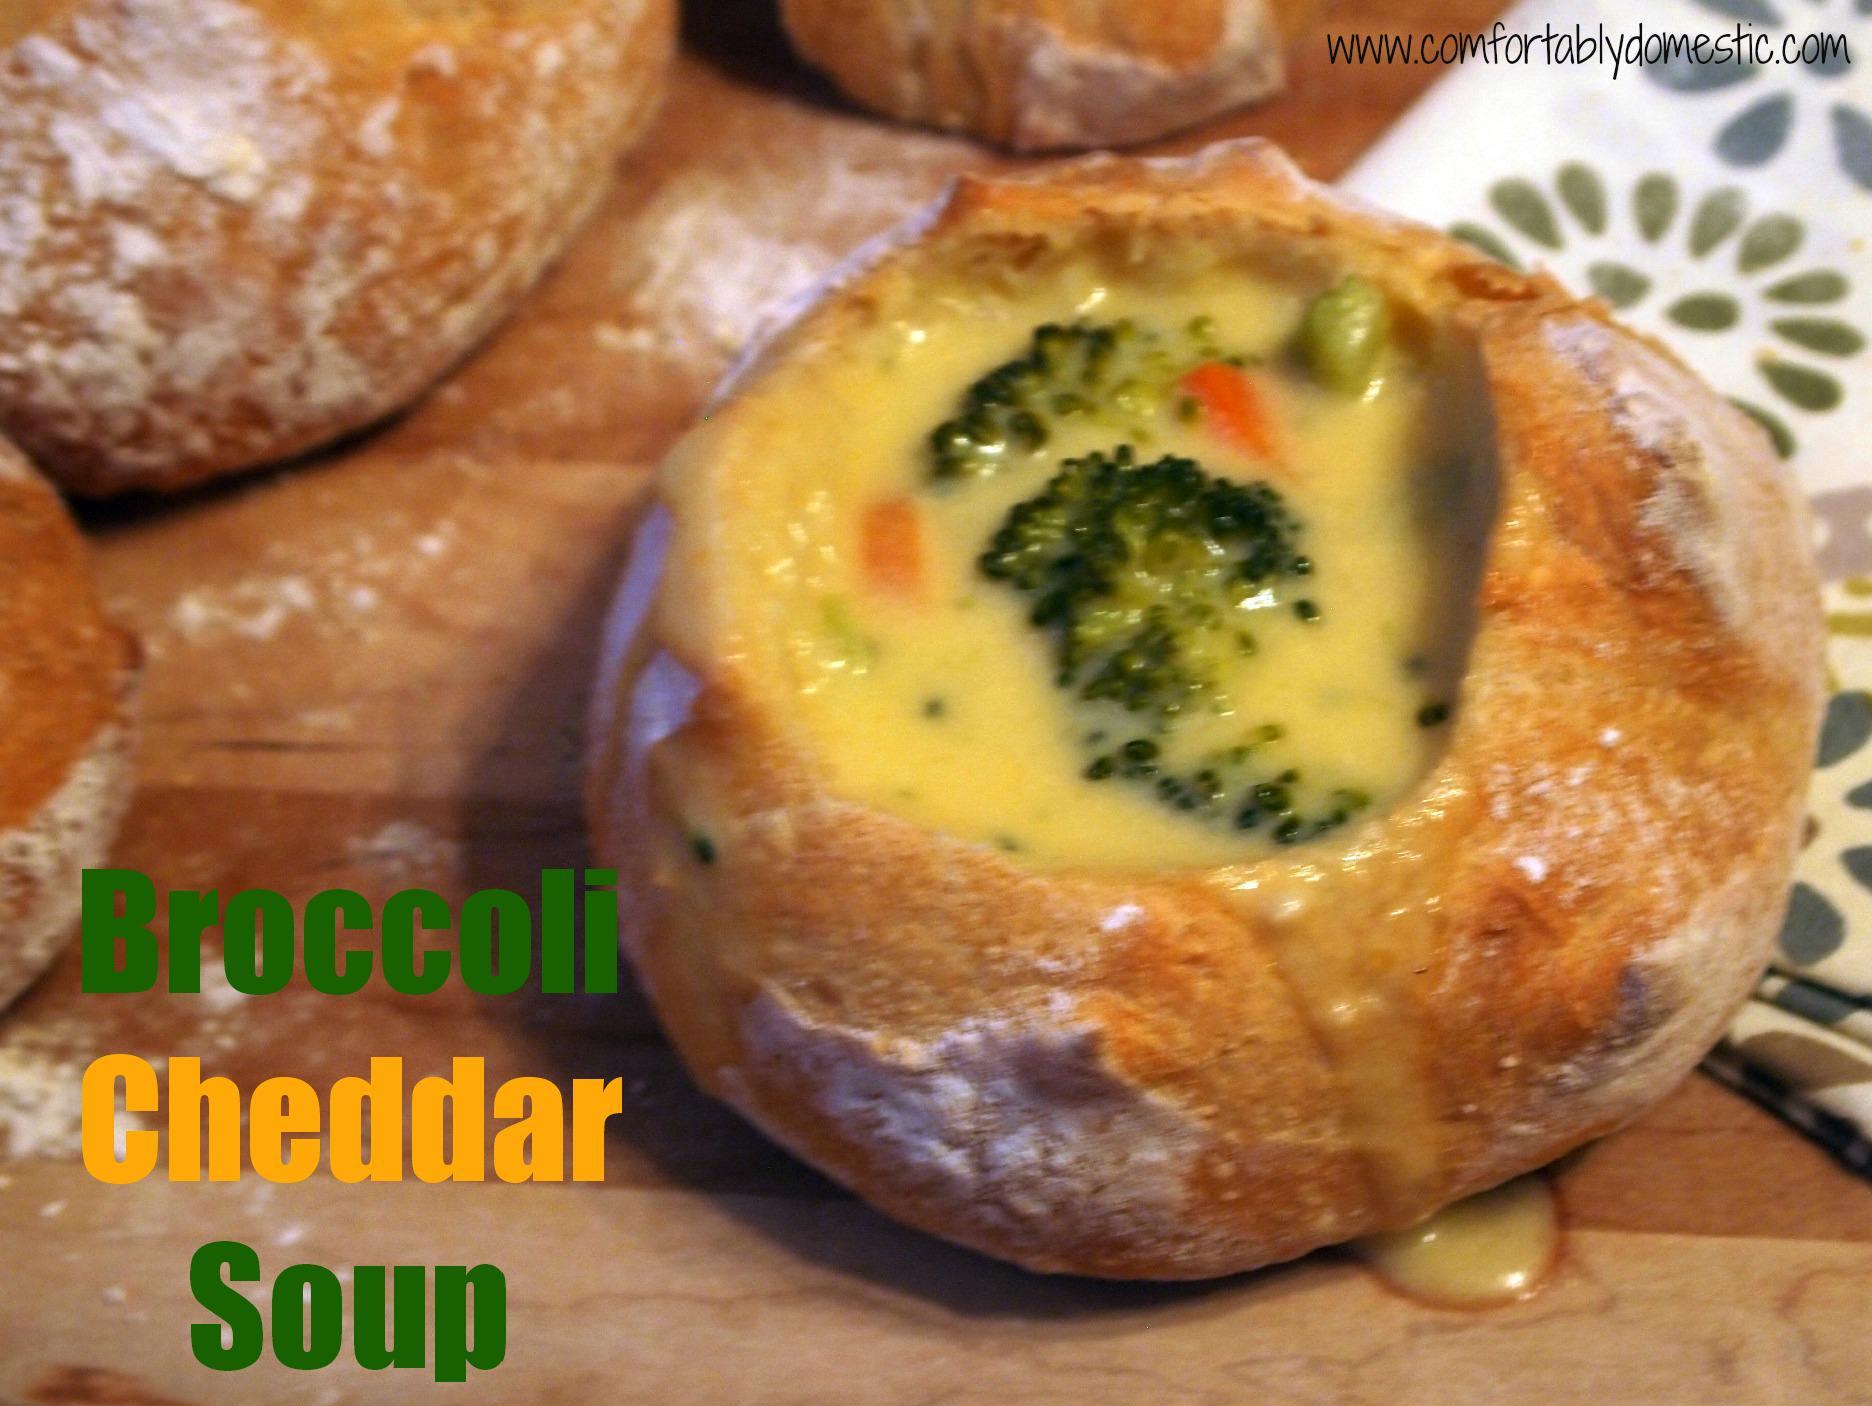 Homemade Broccoli Cheddar Soup | ComfortablyDomestic.com